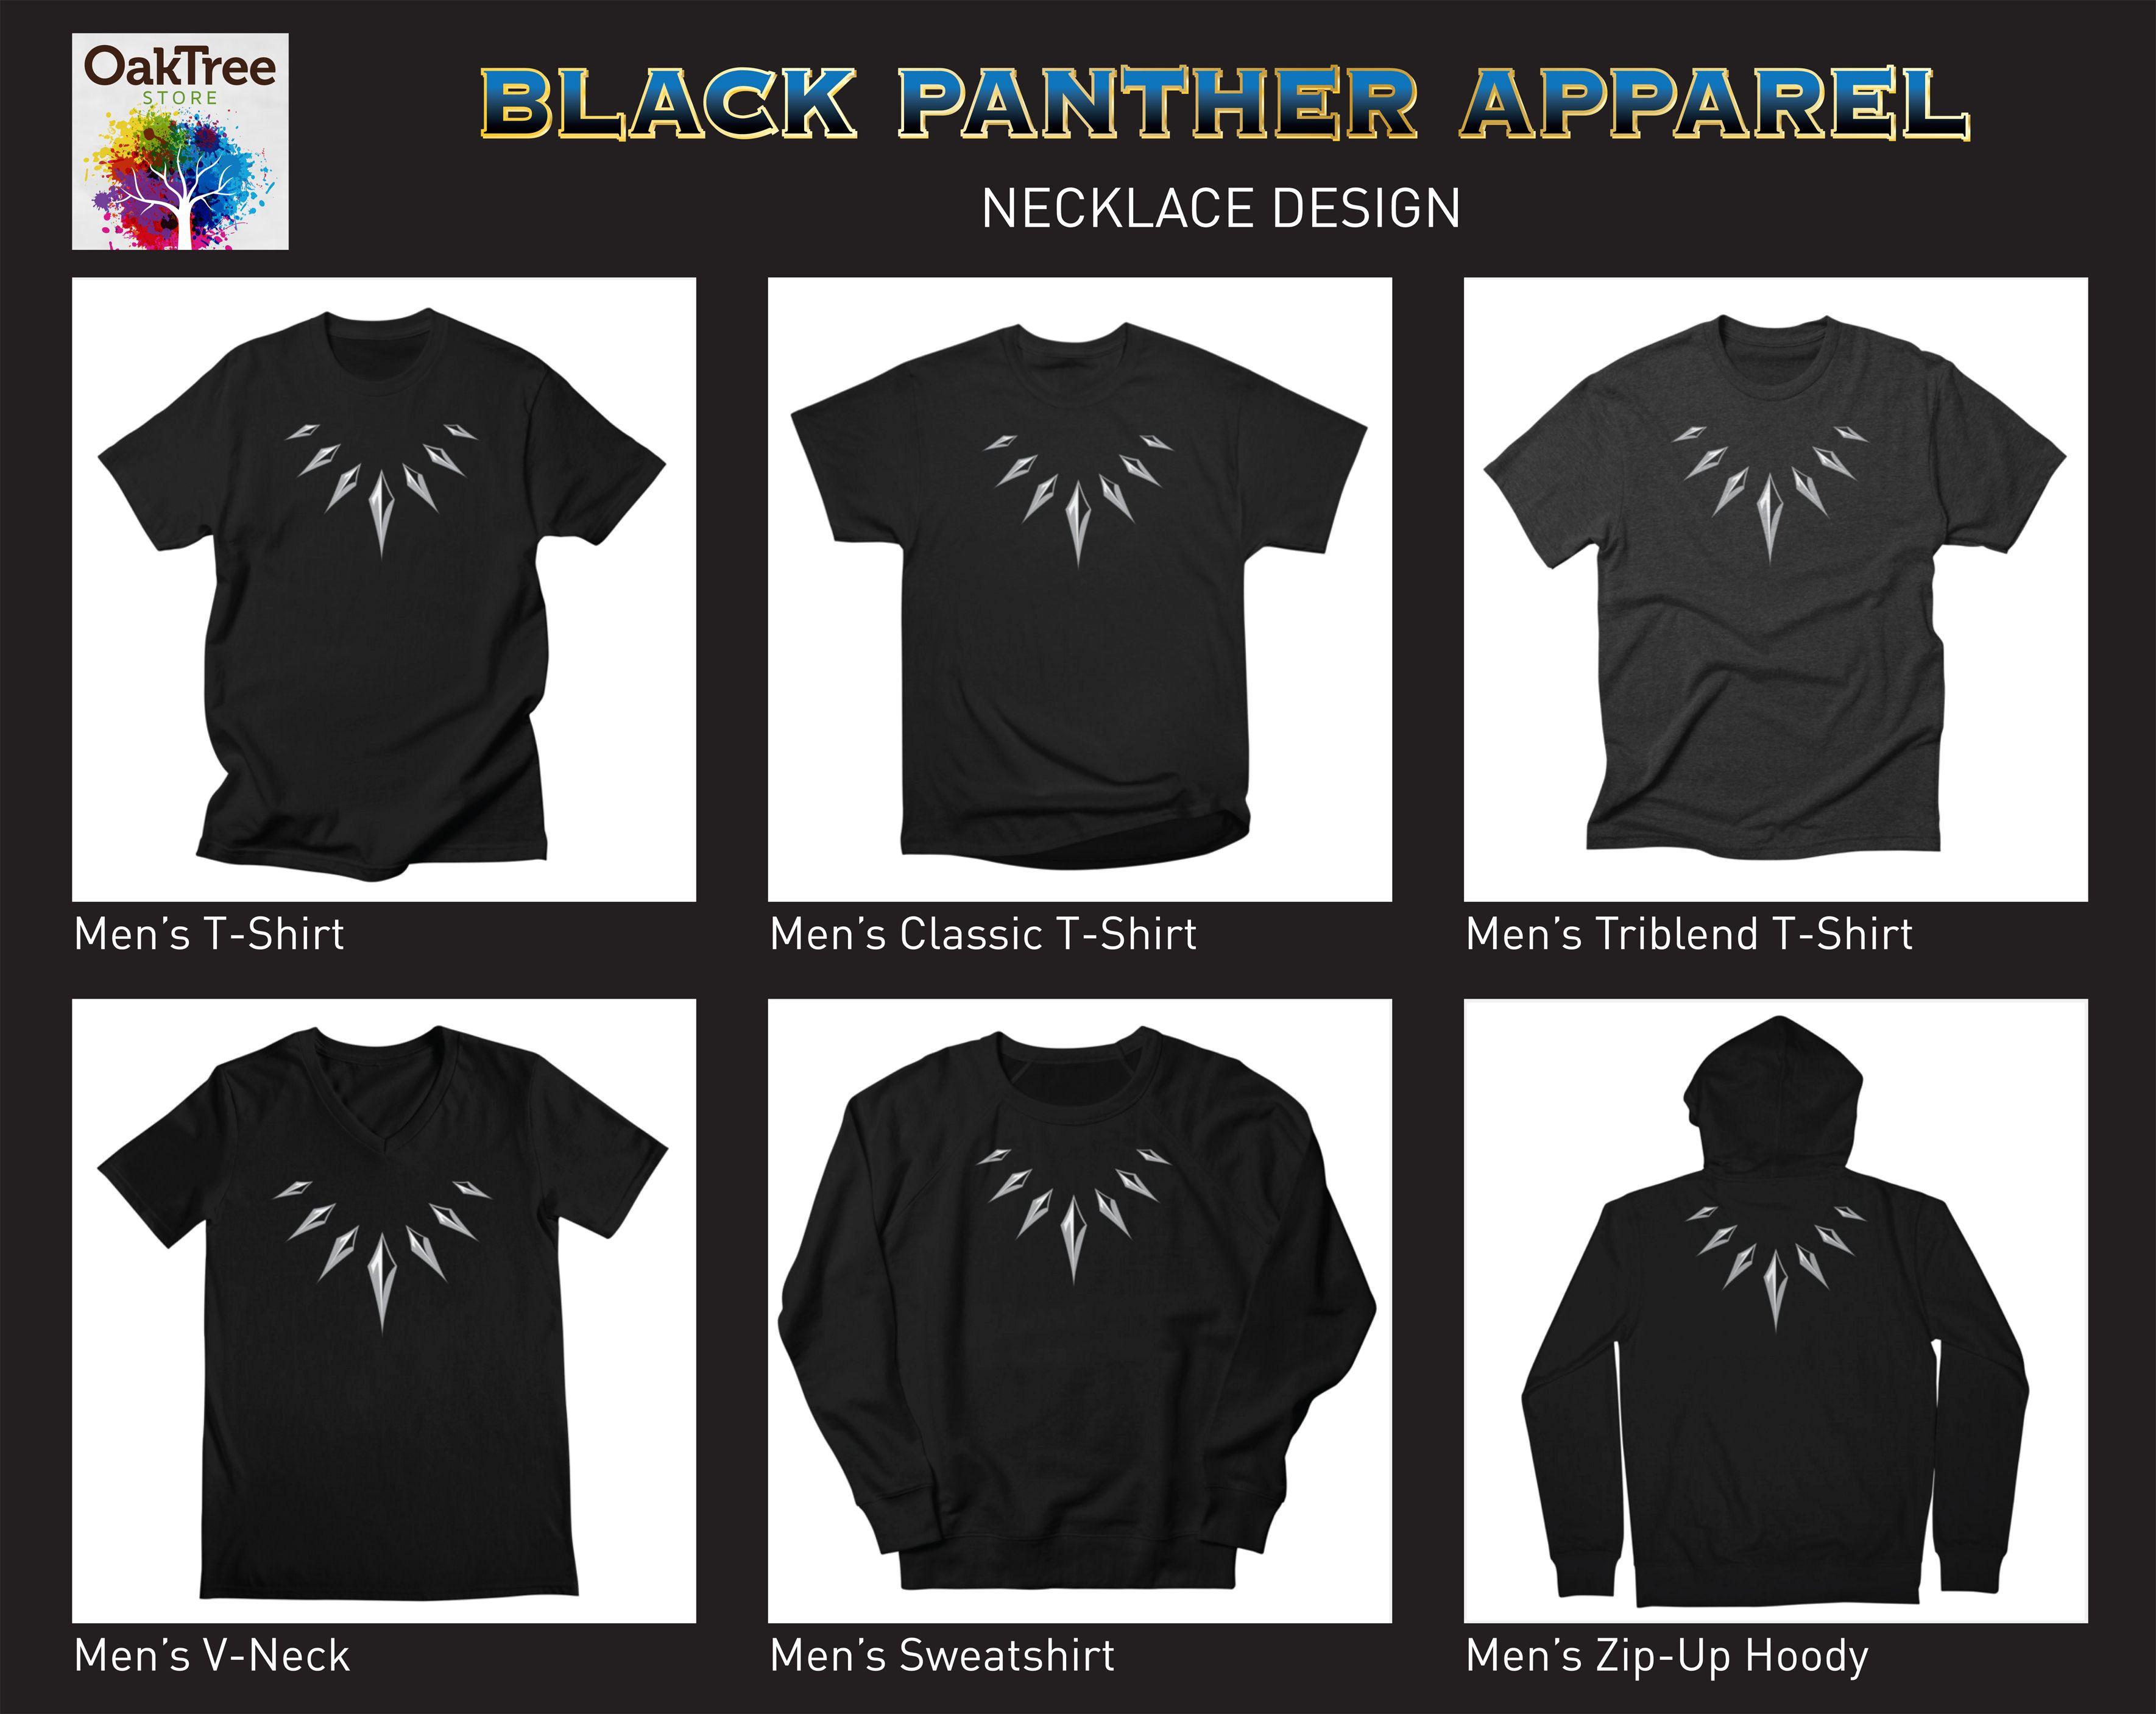 b6b28db7 Get your Black Panther gear! Necklace design Men's, Women's, Kids ...